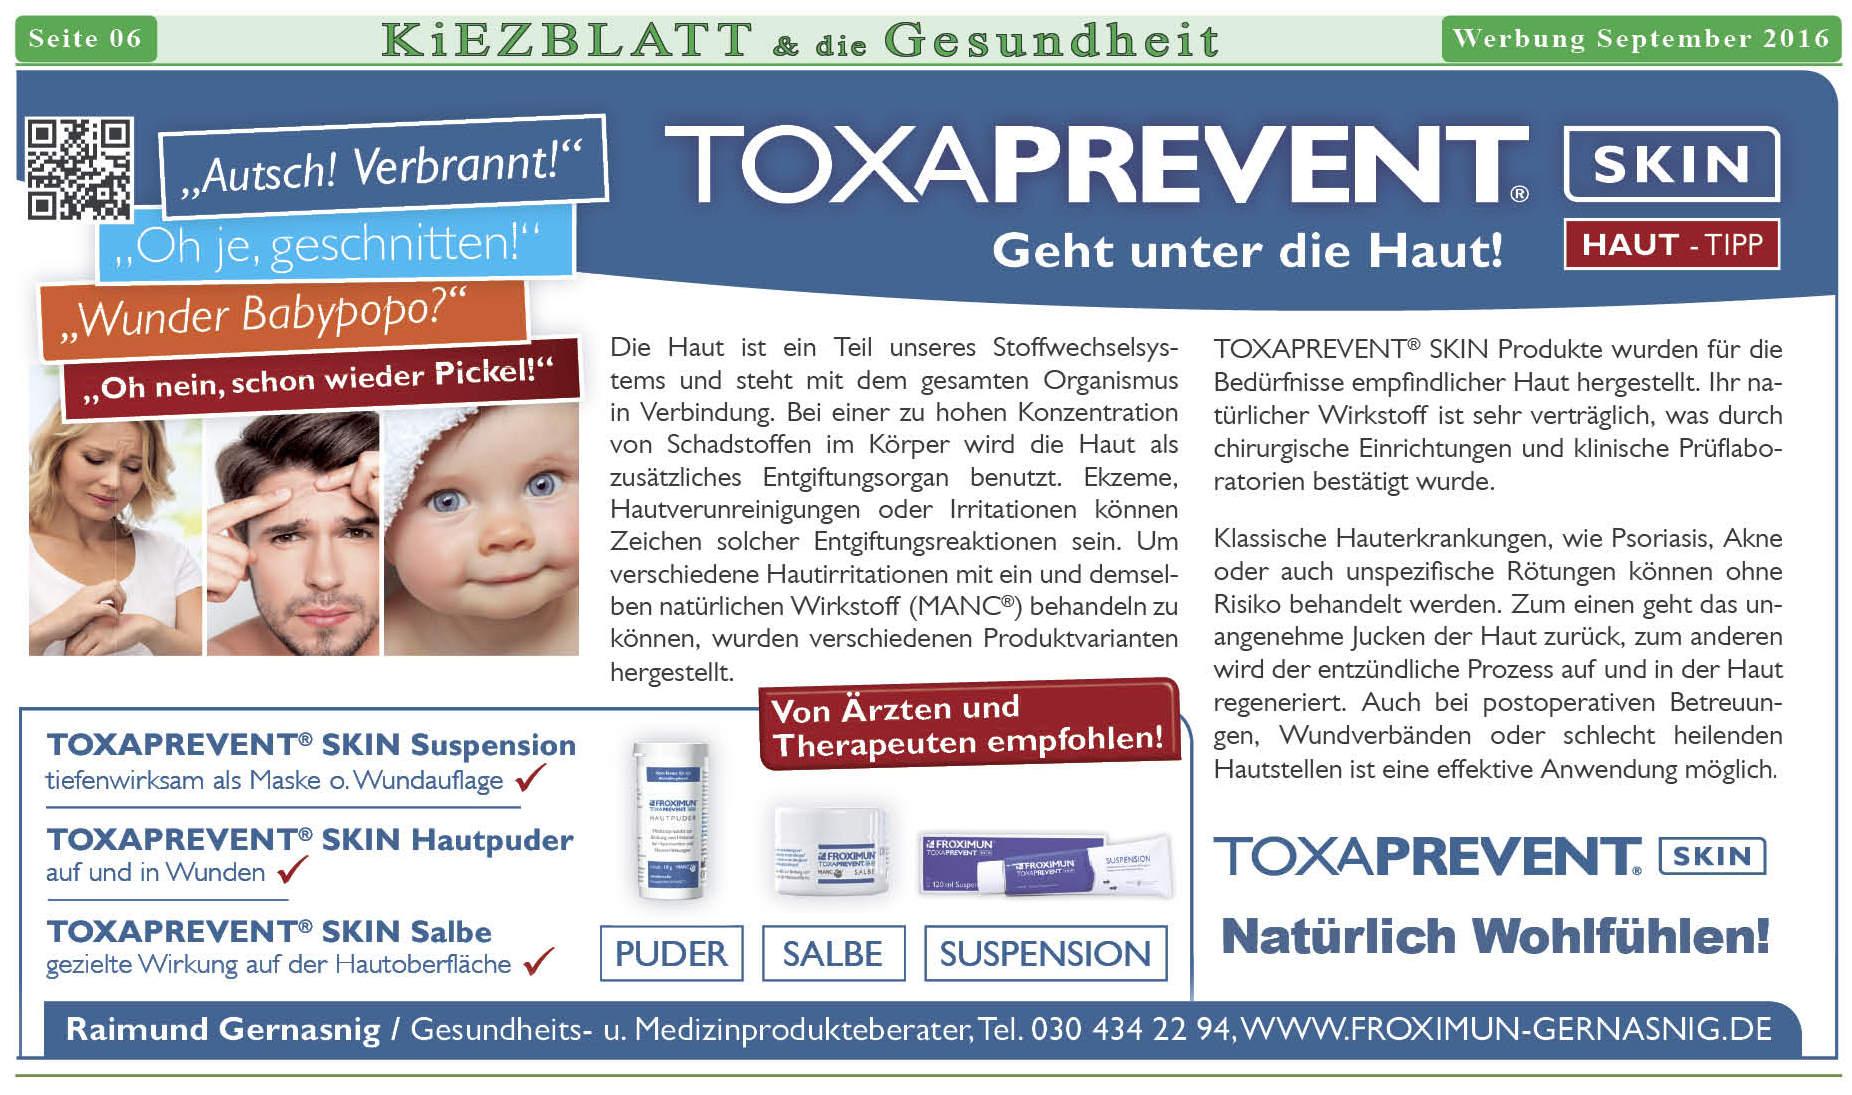 138 wp 06 Toxaprevent Gernasnig Froximun